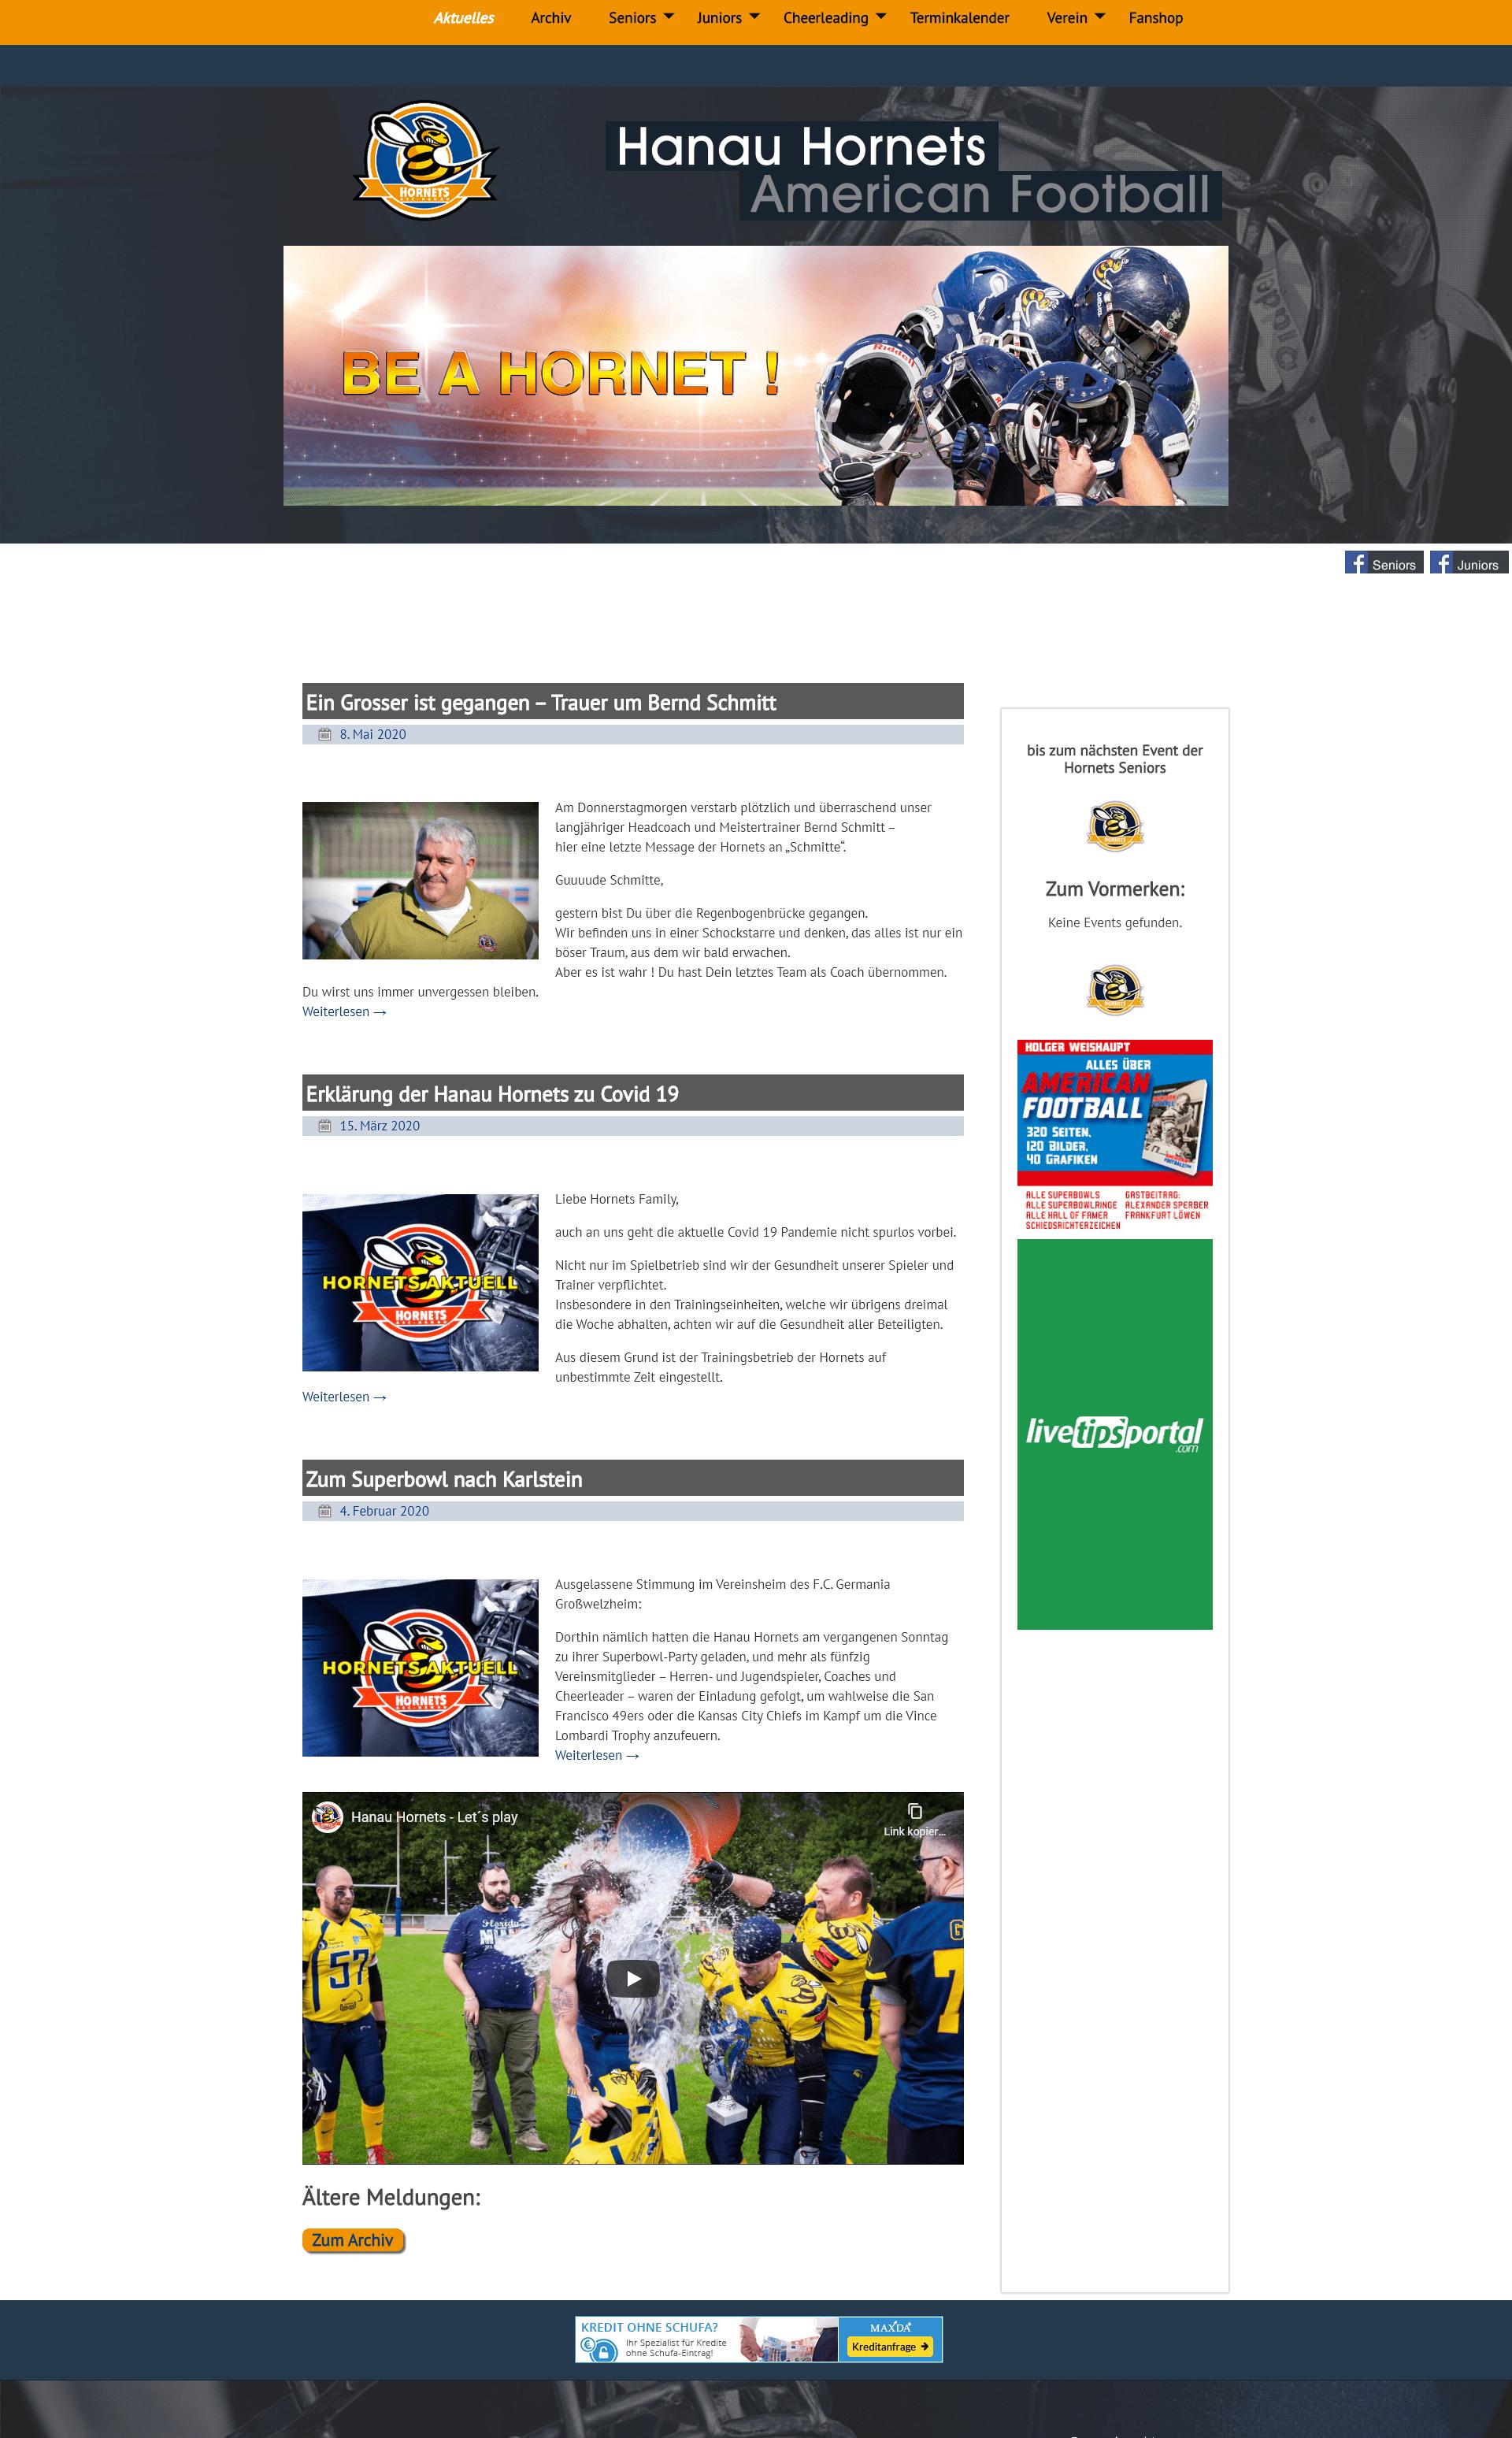 Hanau Hornets website